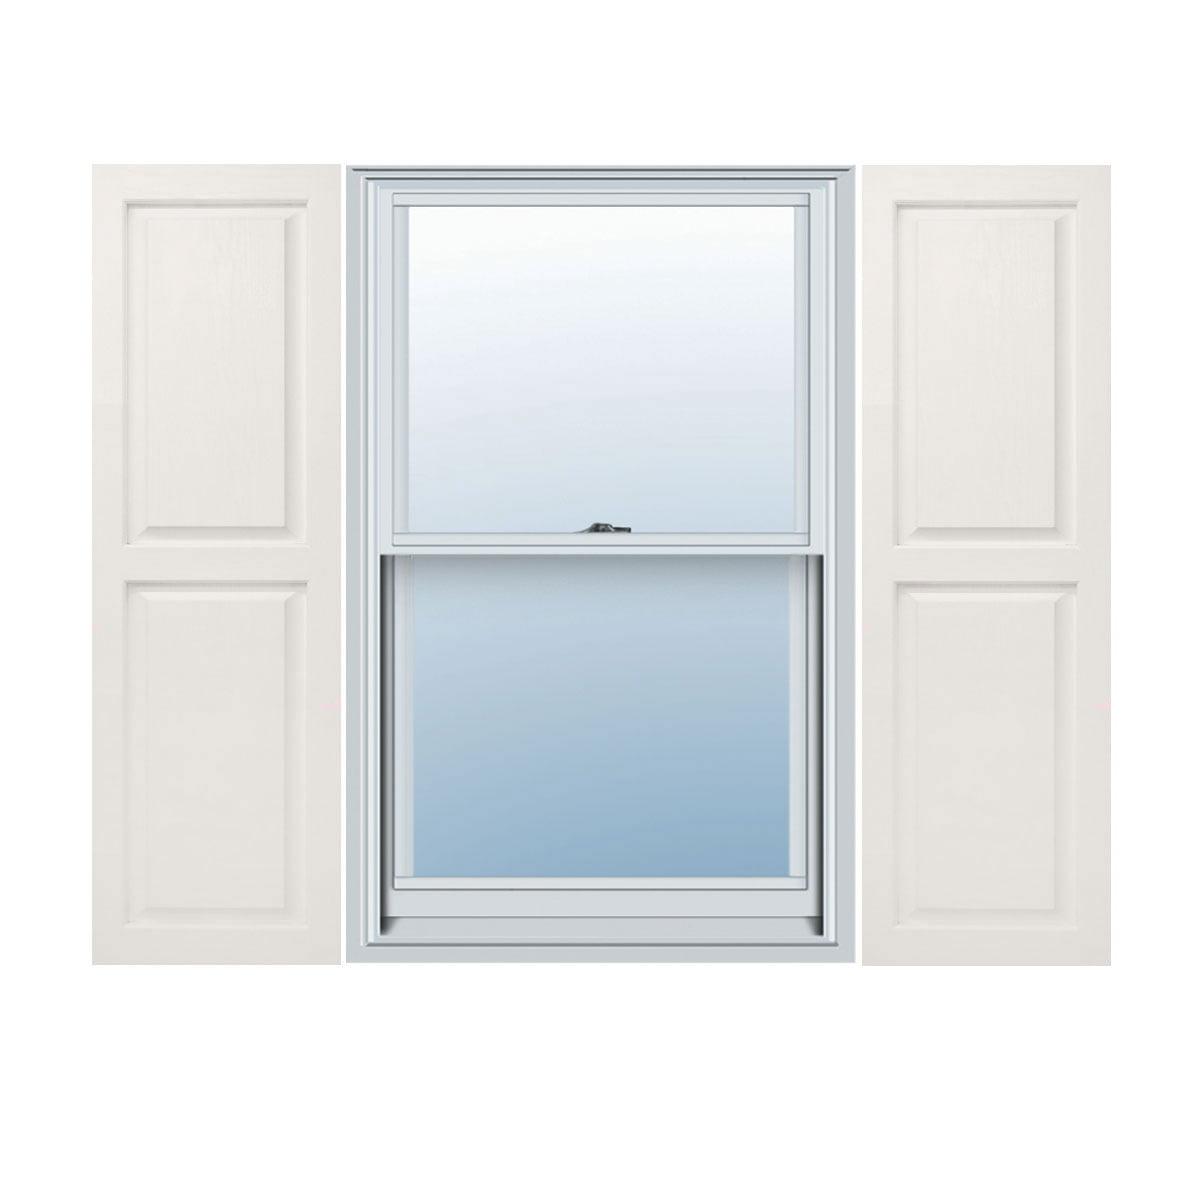 Grey 14 x 62 Builders Choice Vinyl Open Louver Window Shutters Per Pair w//Shutter Spikes /& Screws